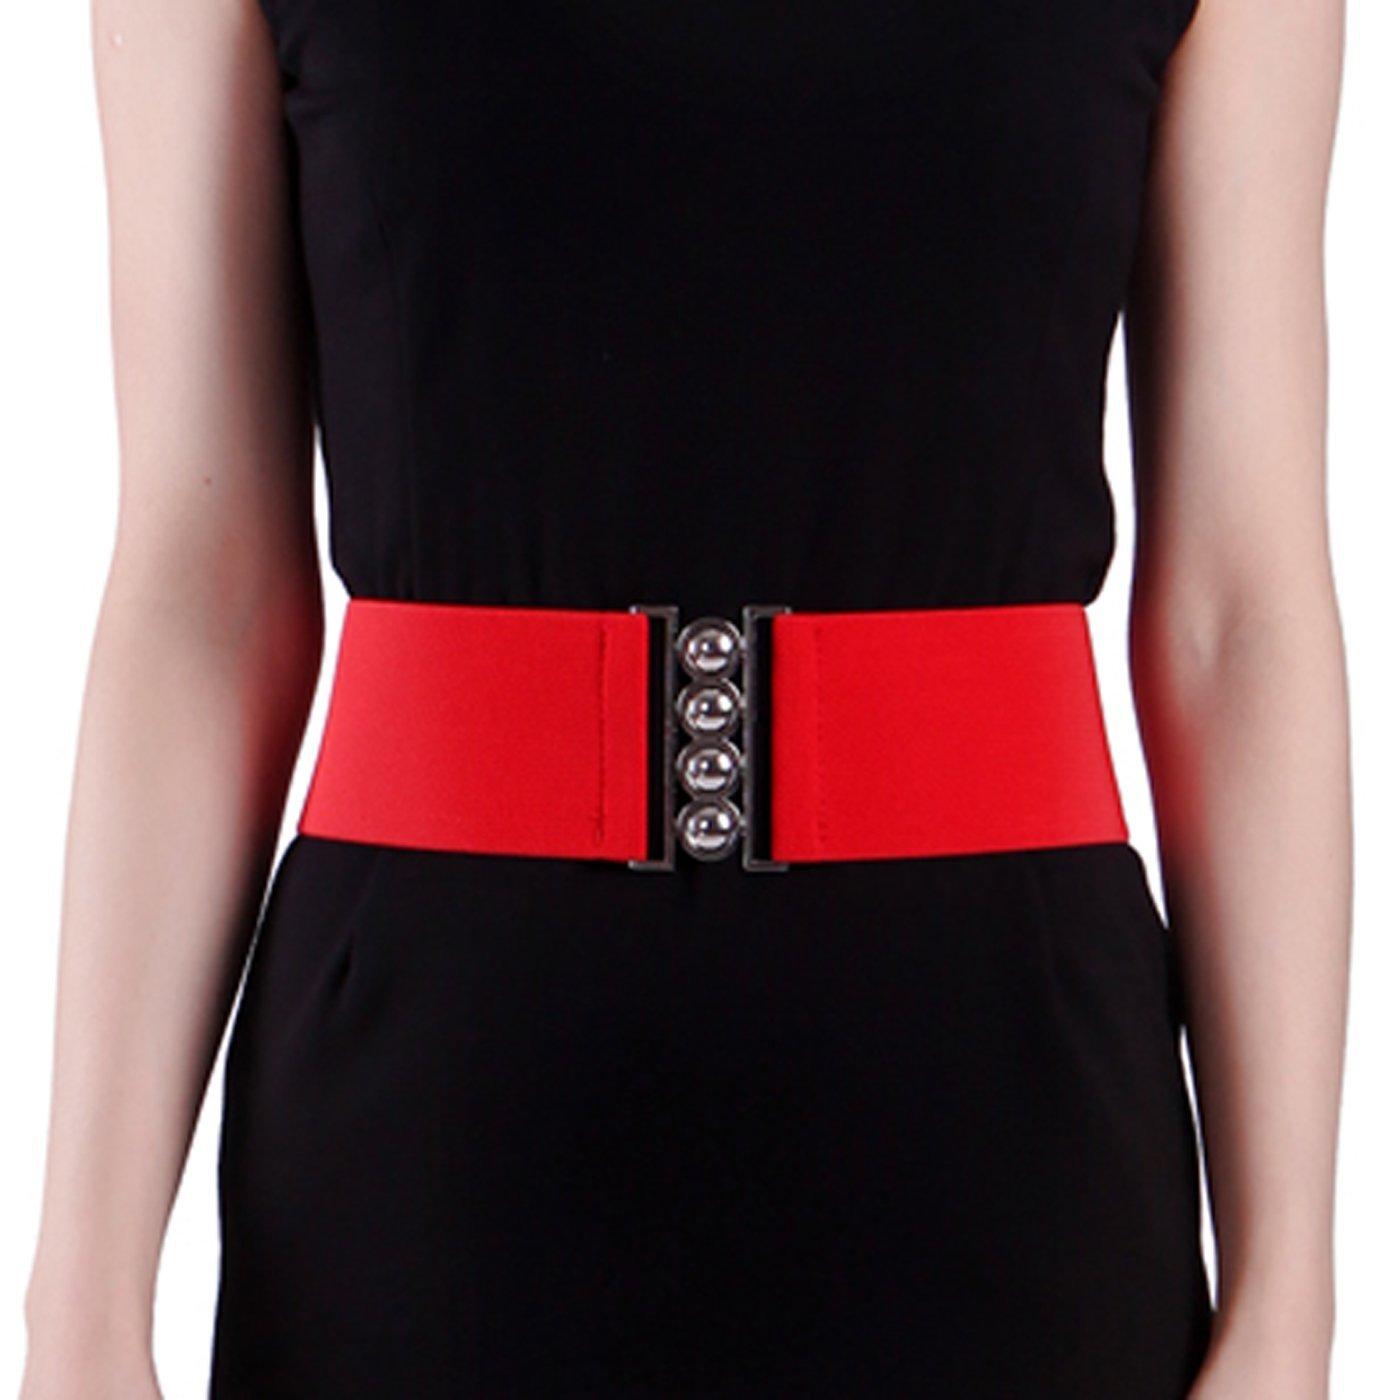 HDE Women's Cinch Belt Elastic Stretch Fashion Waist Band W/Clasp Buckle XS-5X